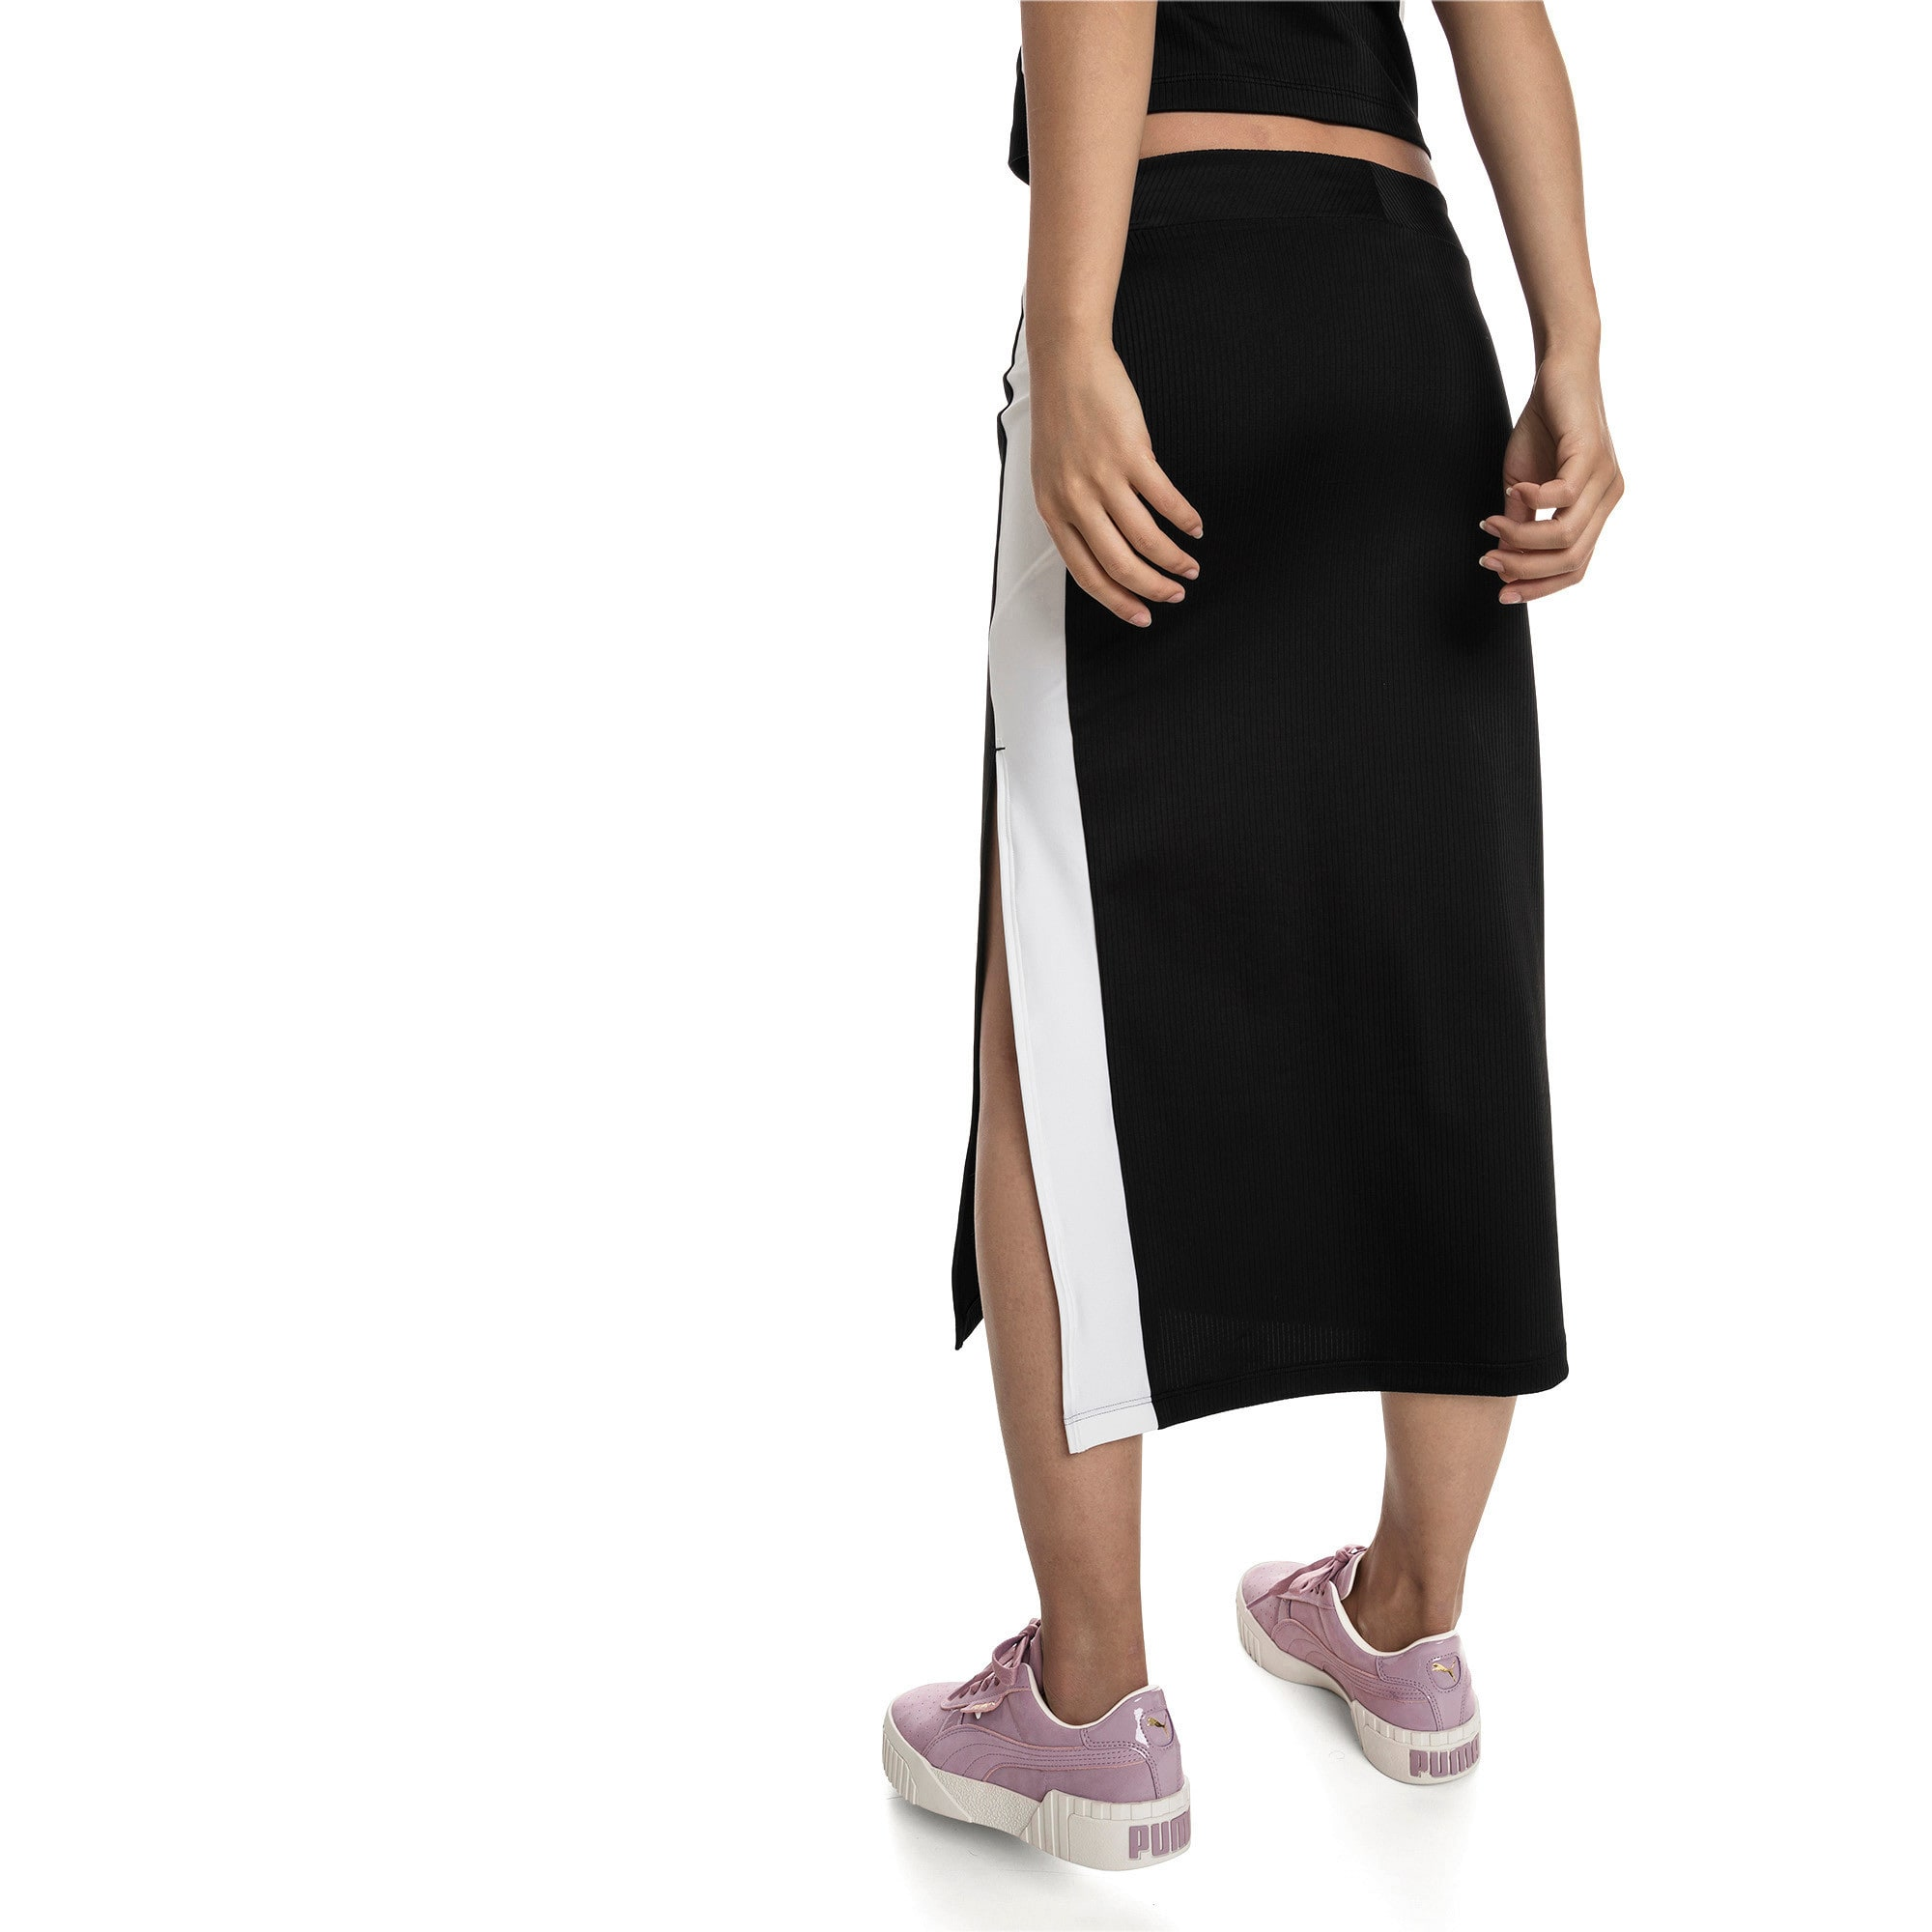 Thumbnail 2 of Classics Women's Skirt, Puma Black, medium